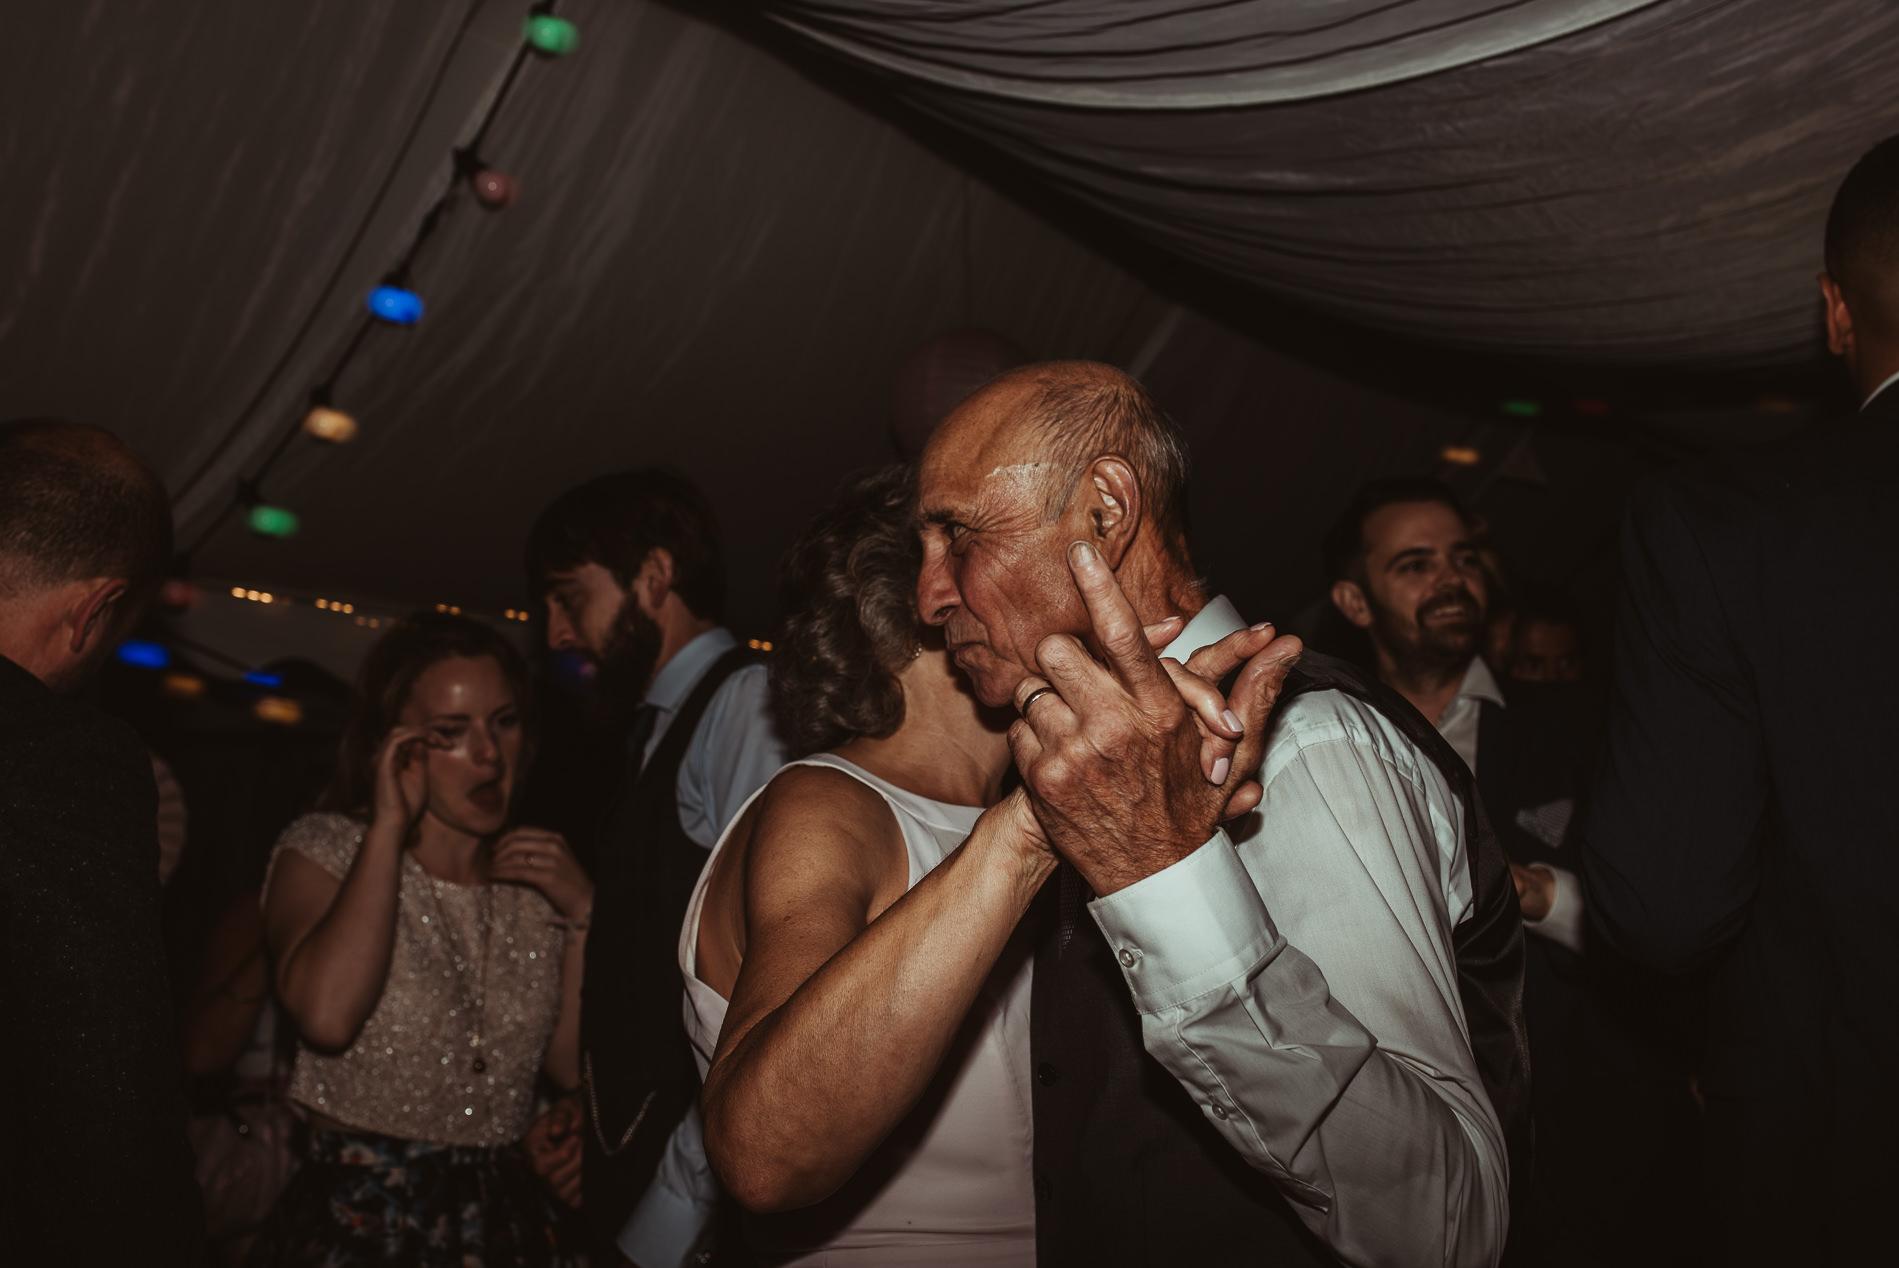 bohemian_wedding_lawshall_church_garden136